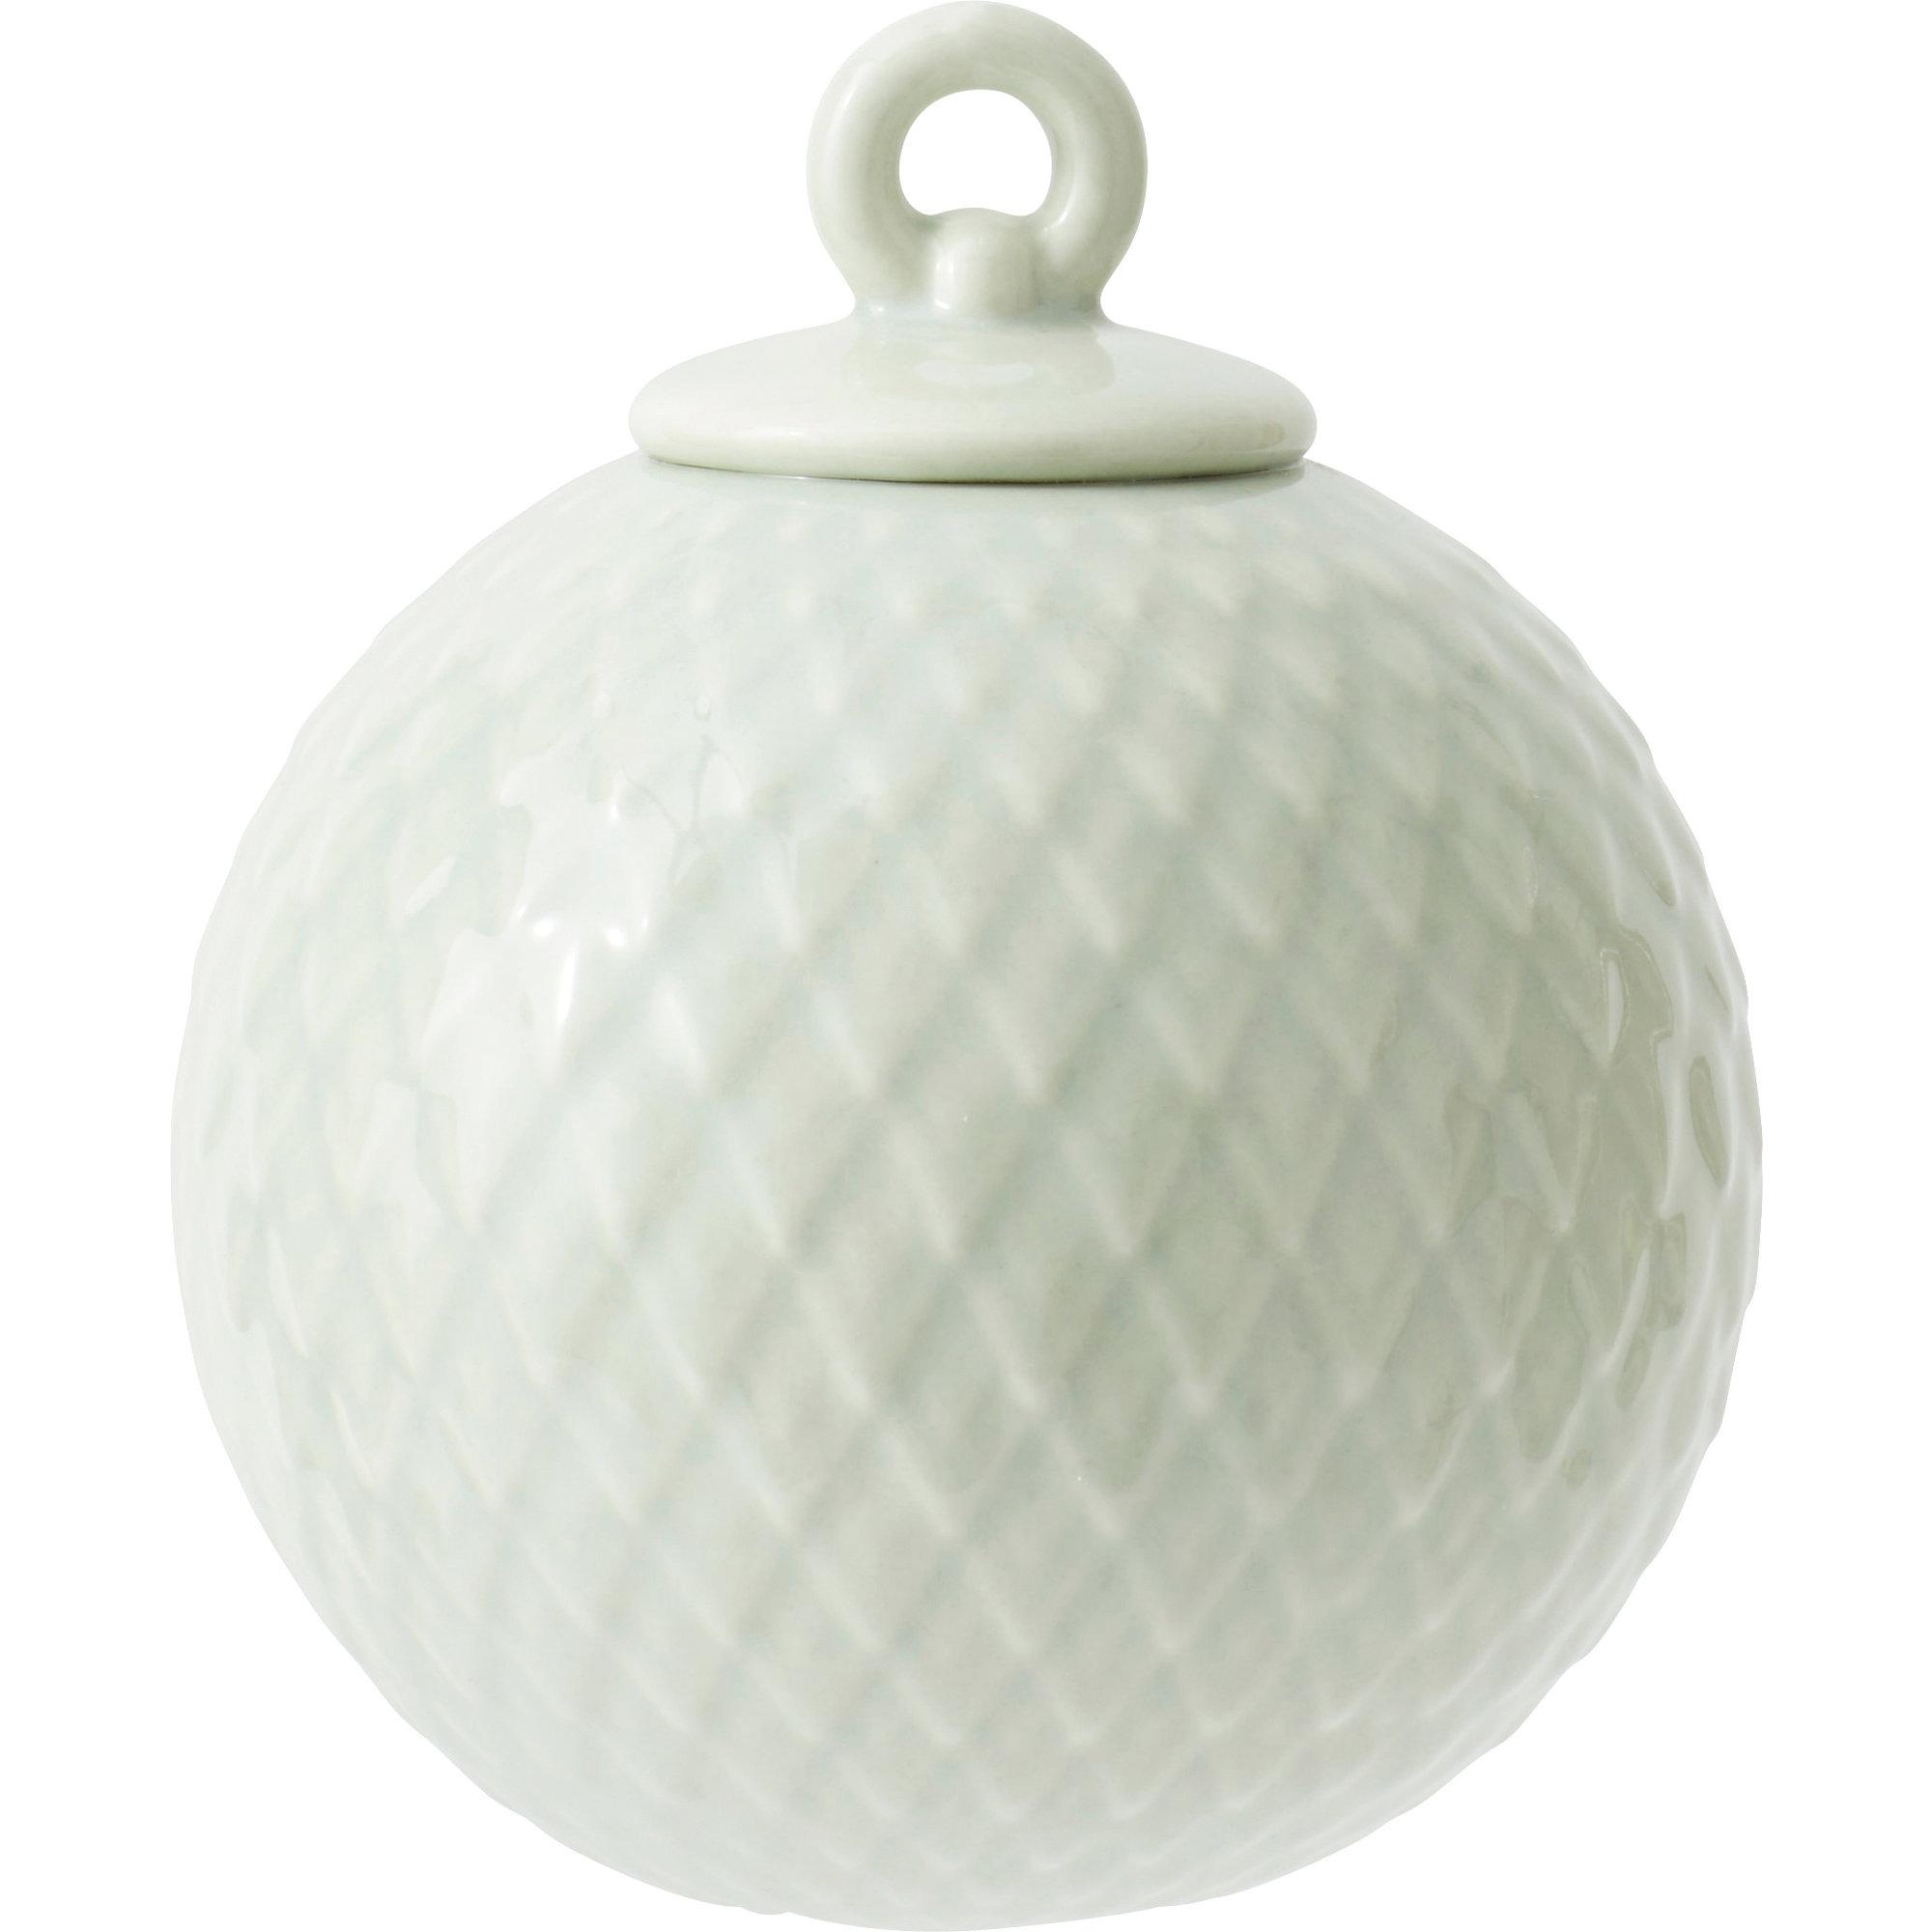 Lyngby Porcelæn Rhombe kula ljusgrön